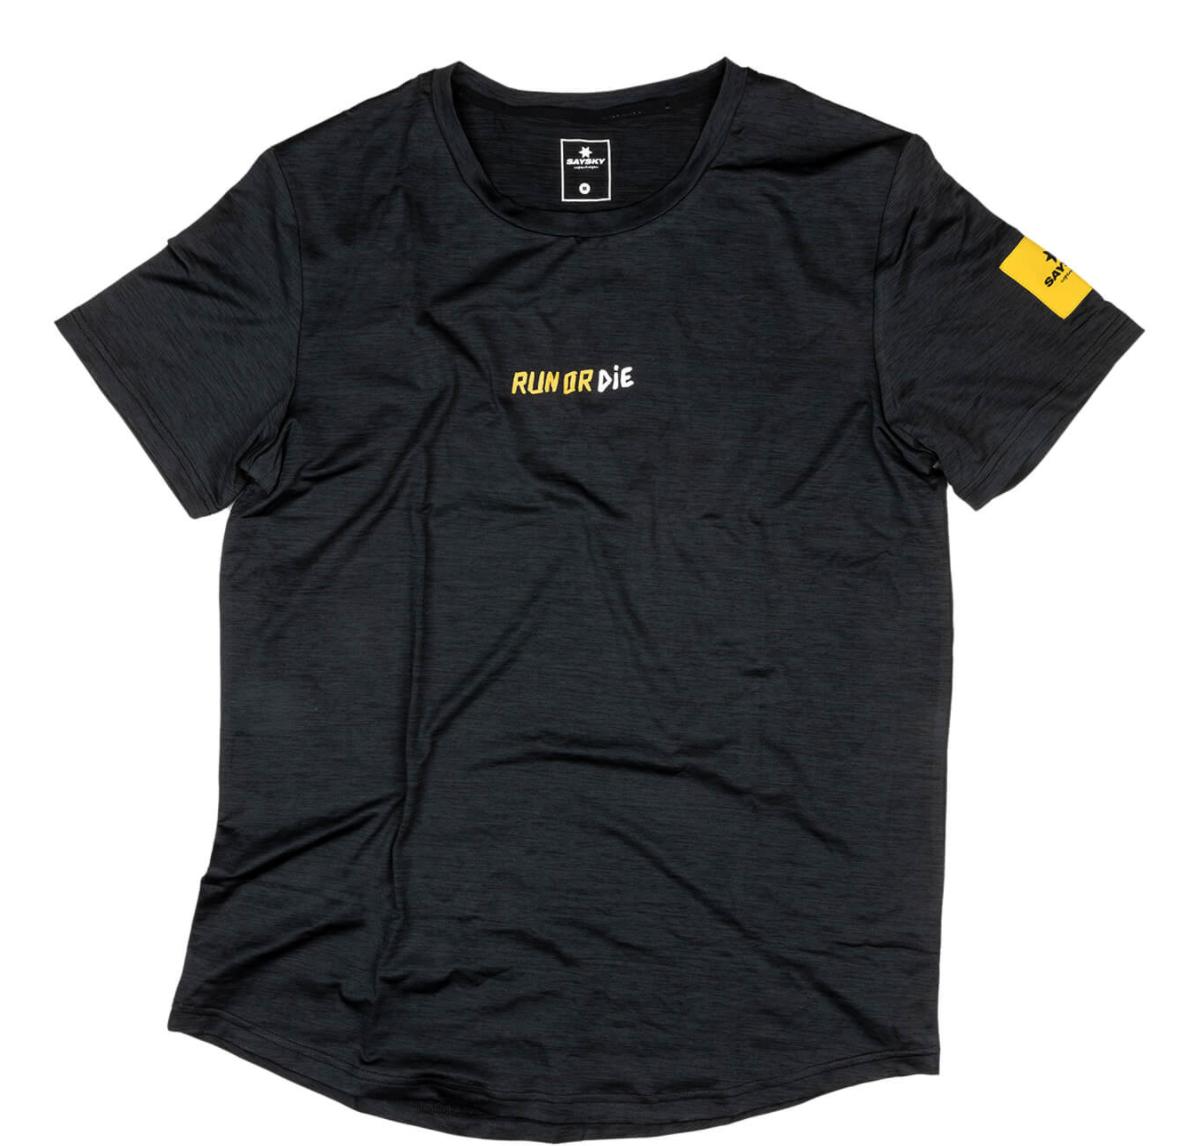 【NEW!】SAYSKY セイスカイ ランニングTシャツ Run Or Die Pace Tee - BLACK MELANGE [ユニセックス] FMRSS04